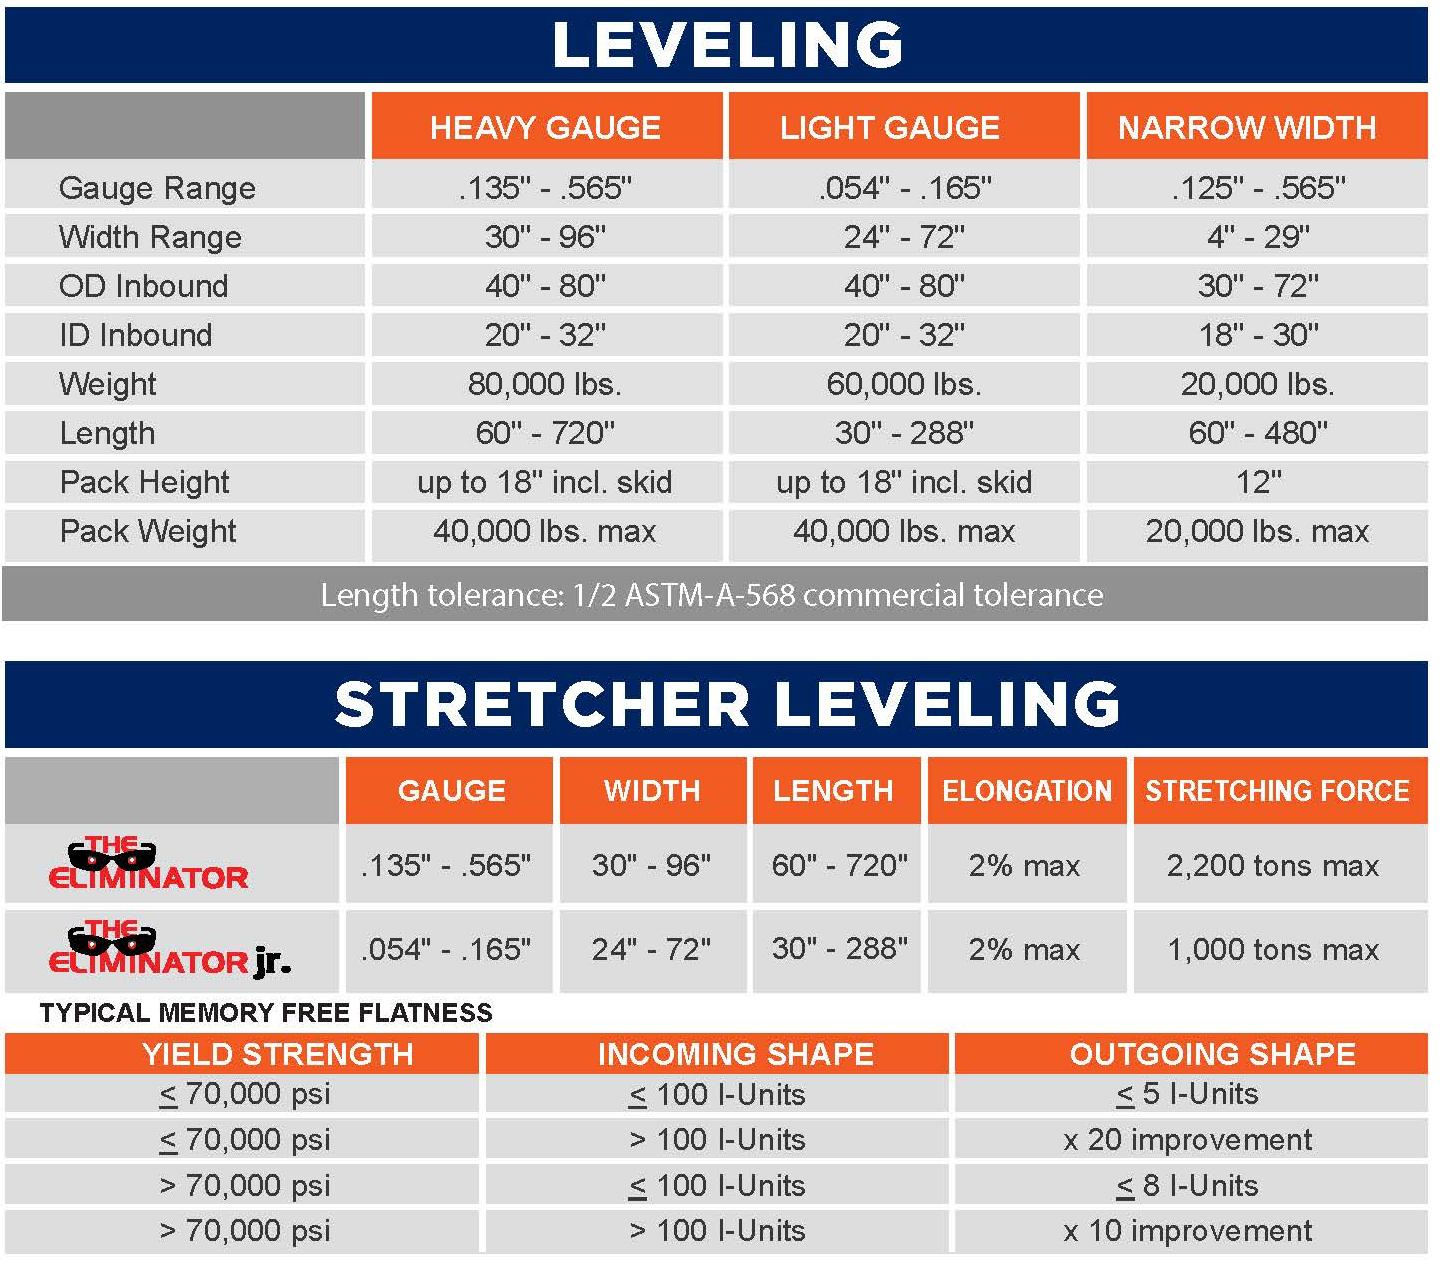 leveling capabilities